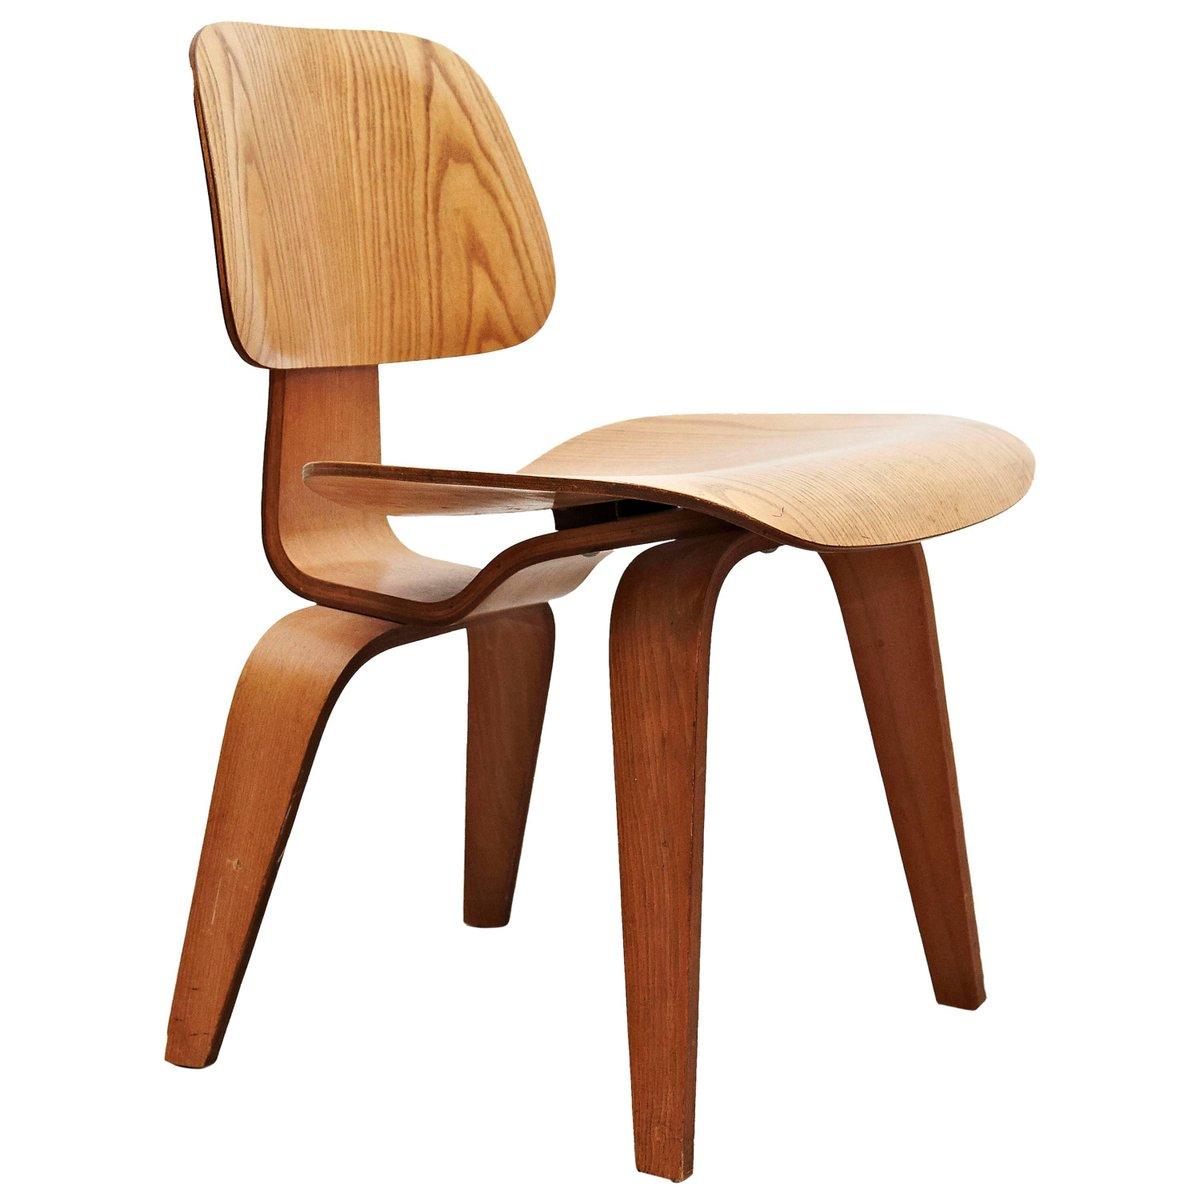 dcw stuhl von charles ray eames f r herman miller 1950er bei pamono kaufen. Black Bedroom Furniture Sets. Home Design Ideas